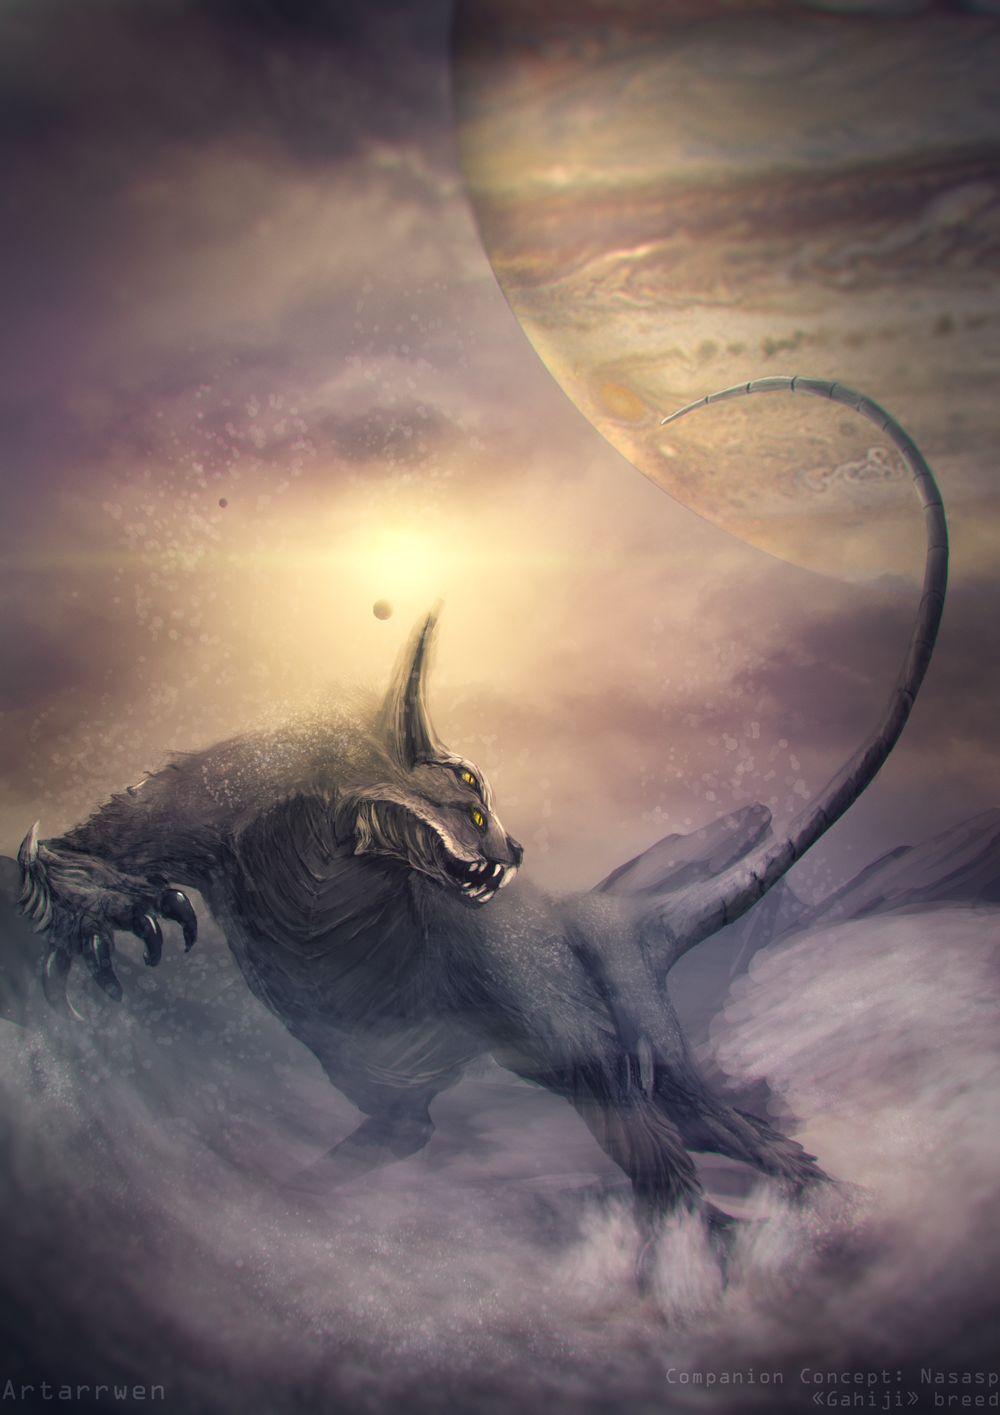 Feline alien creature concept